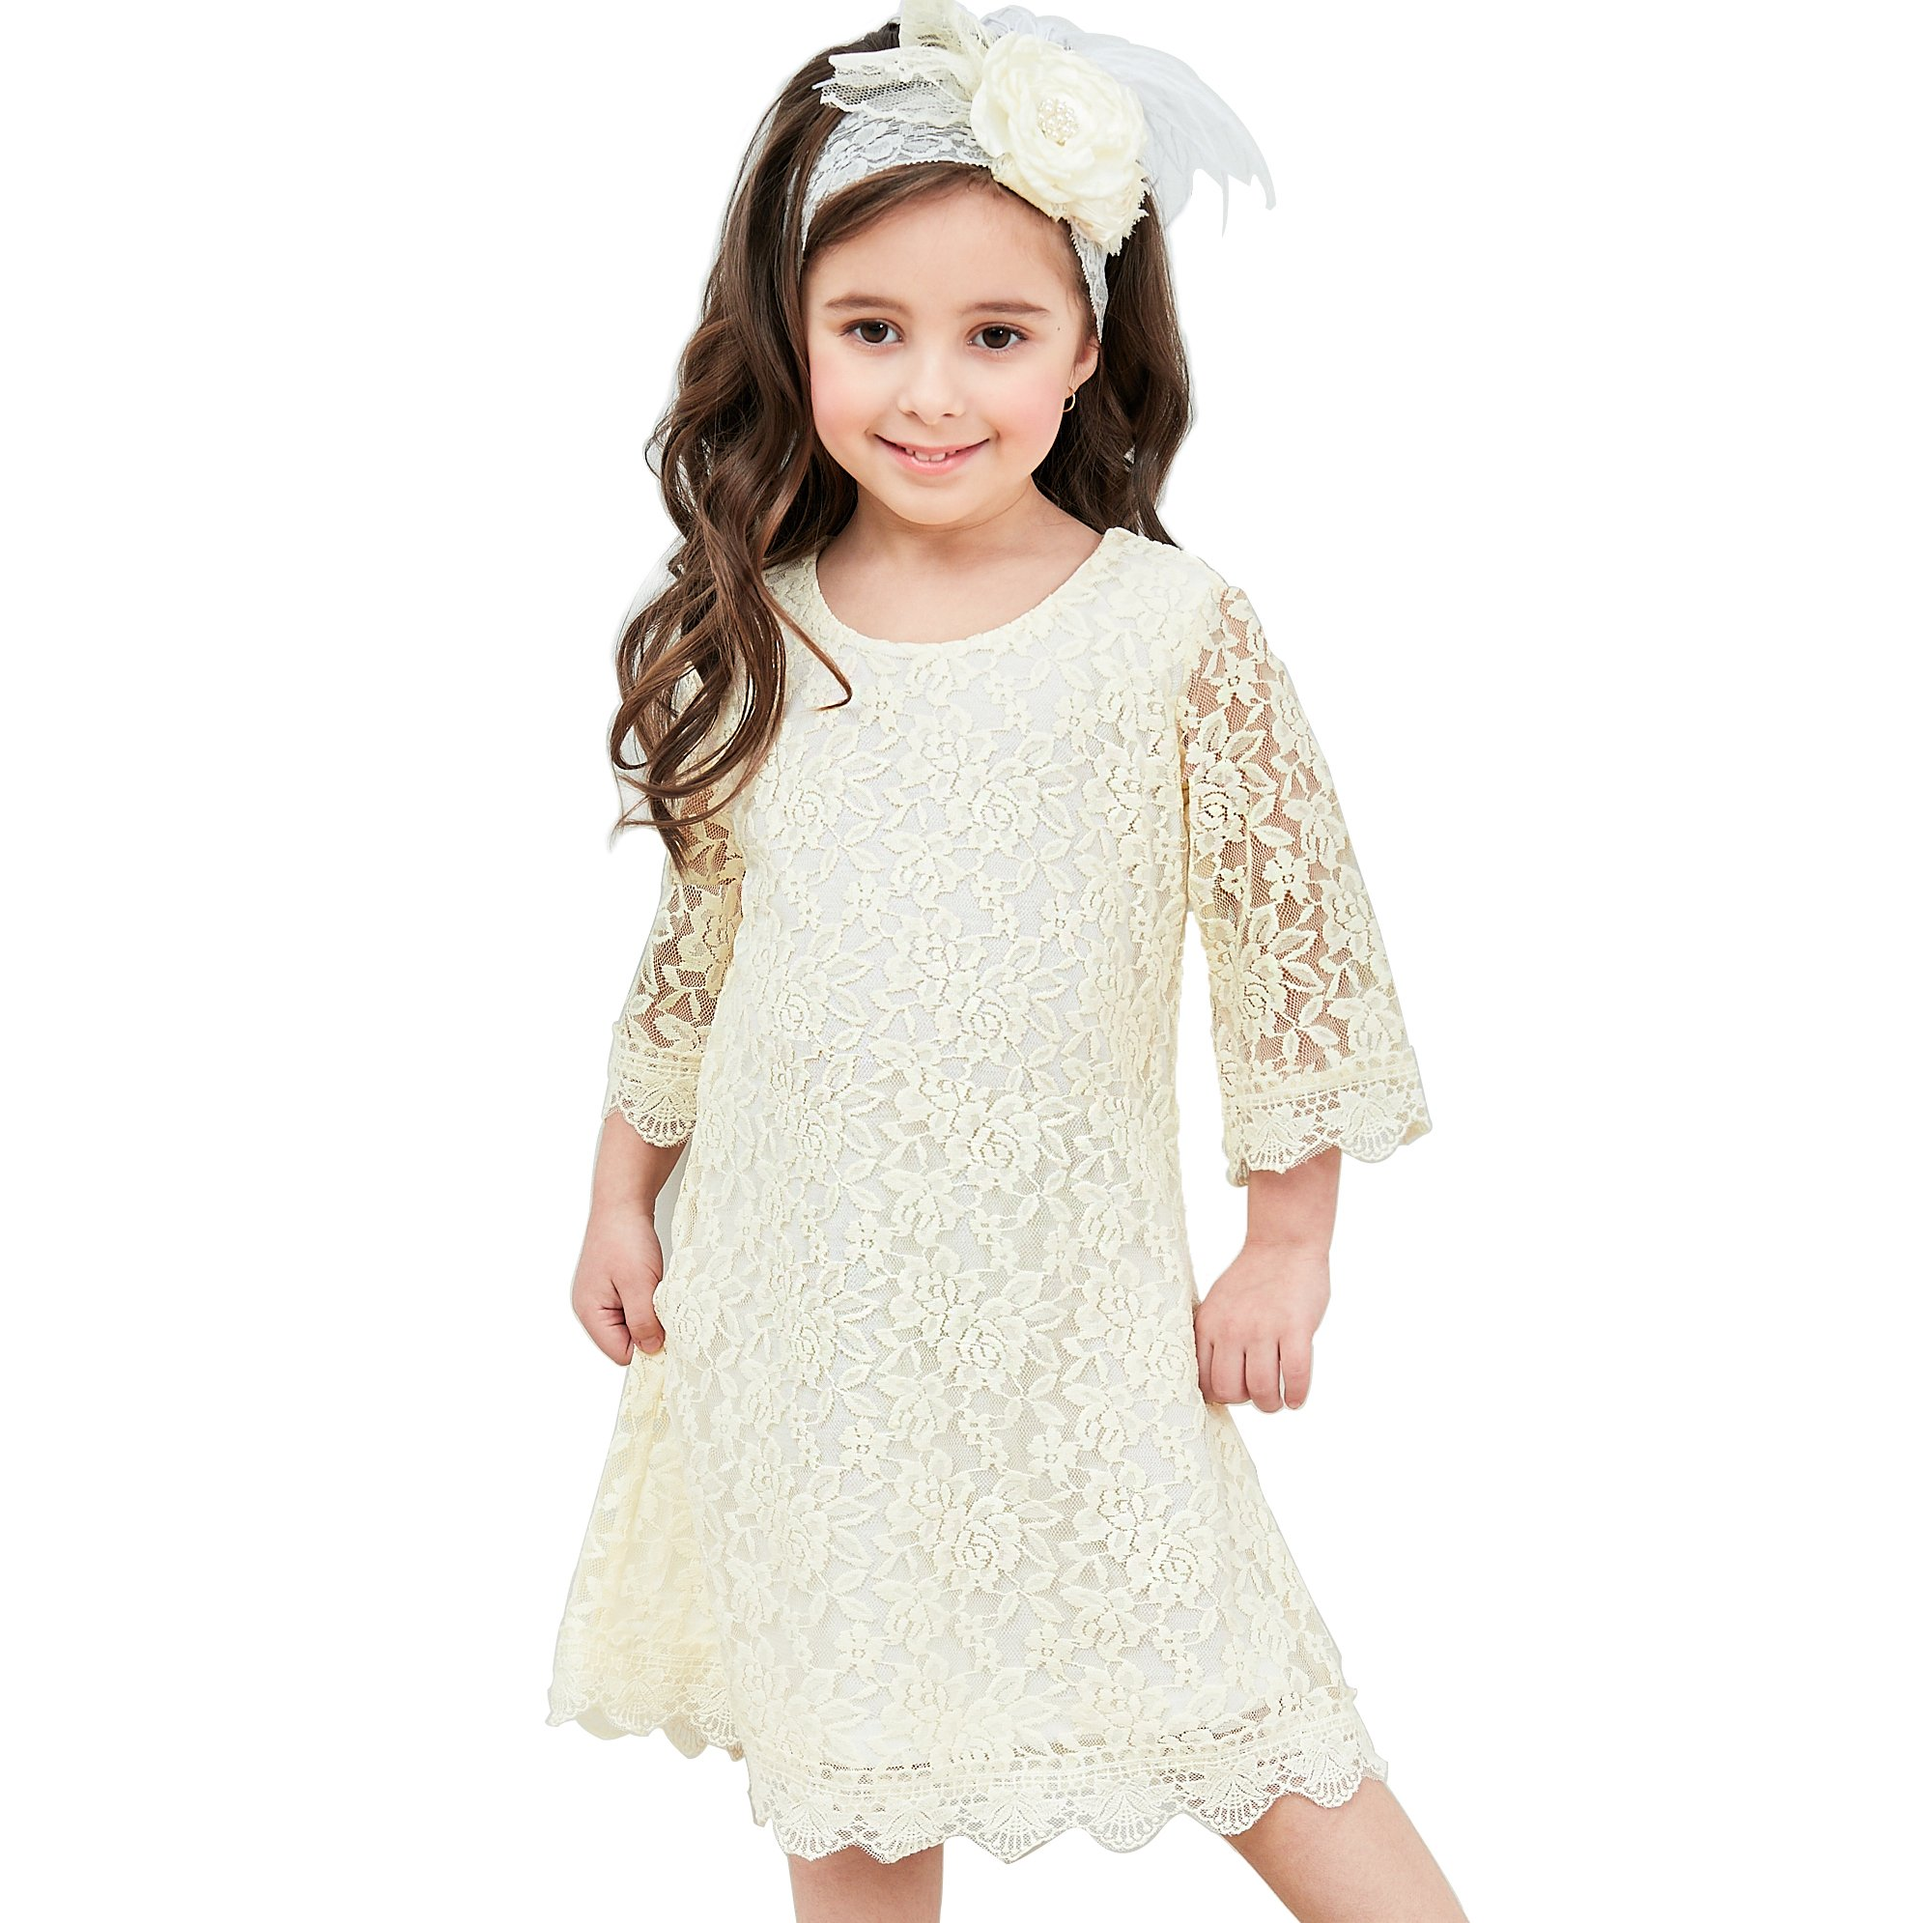 APRIL GIRL Flower Girl Dress, Lace Dress 3/4 Sleeve Dress (Ivory, 2T)